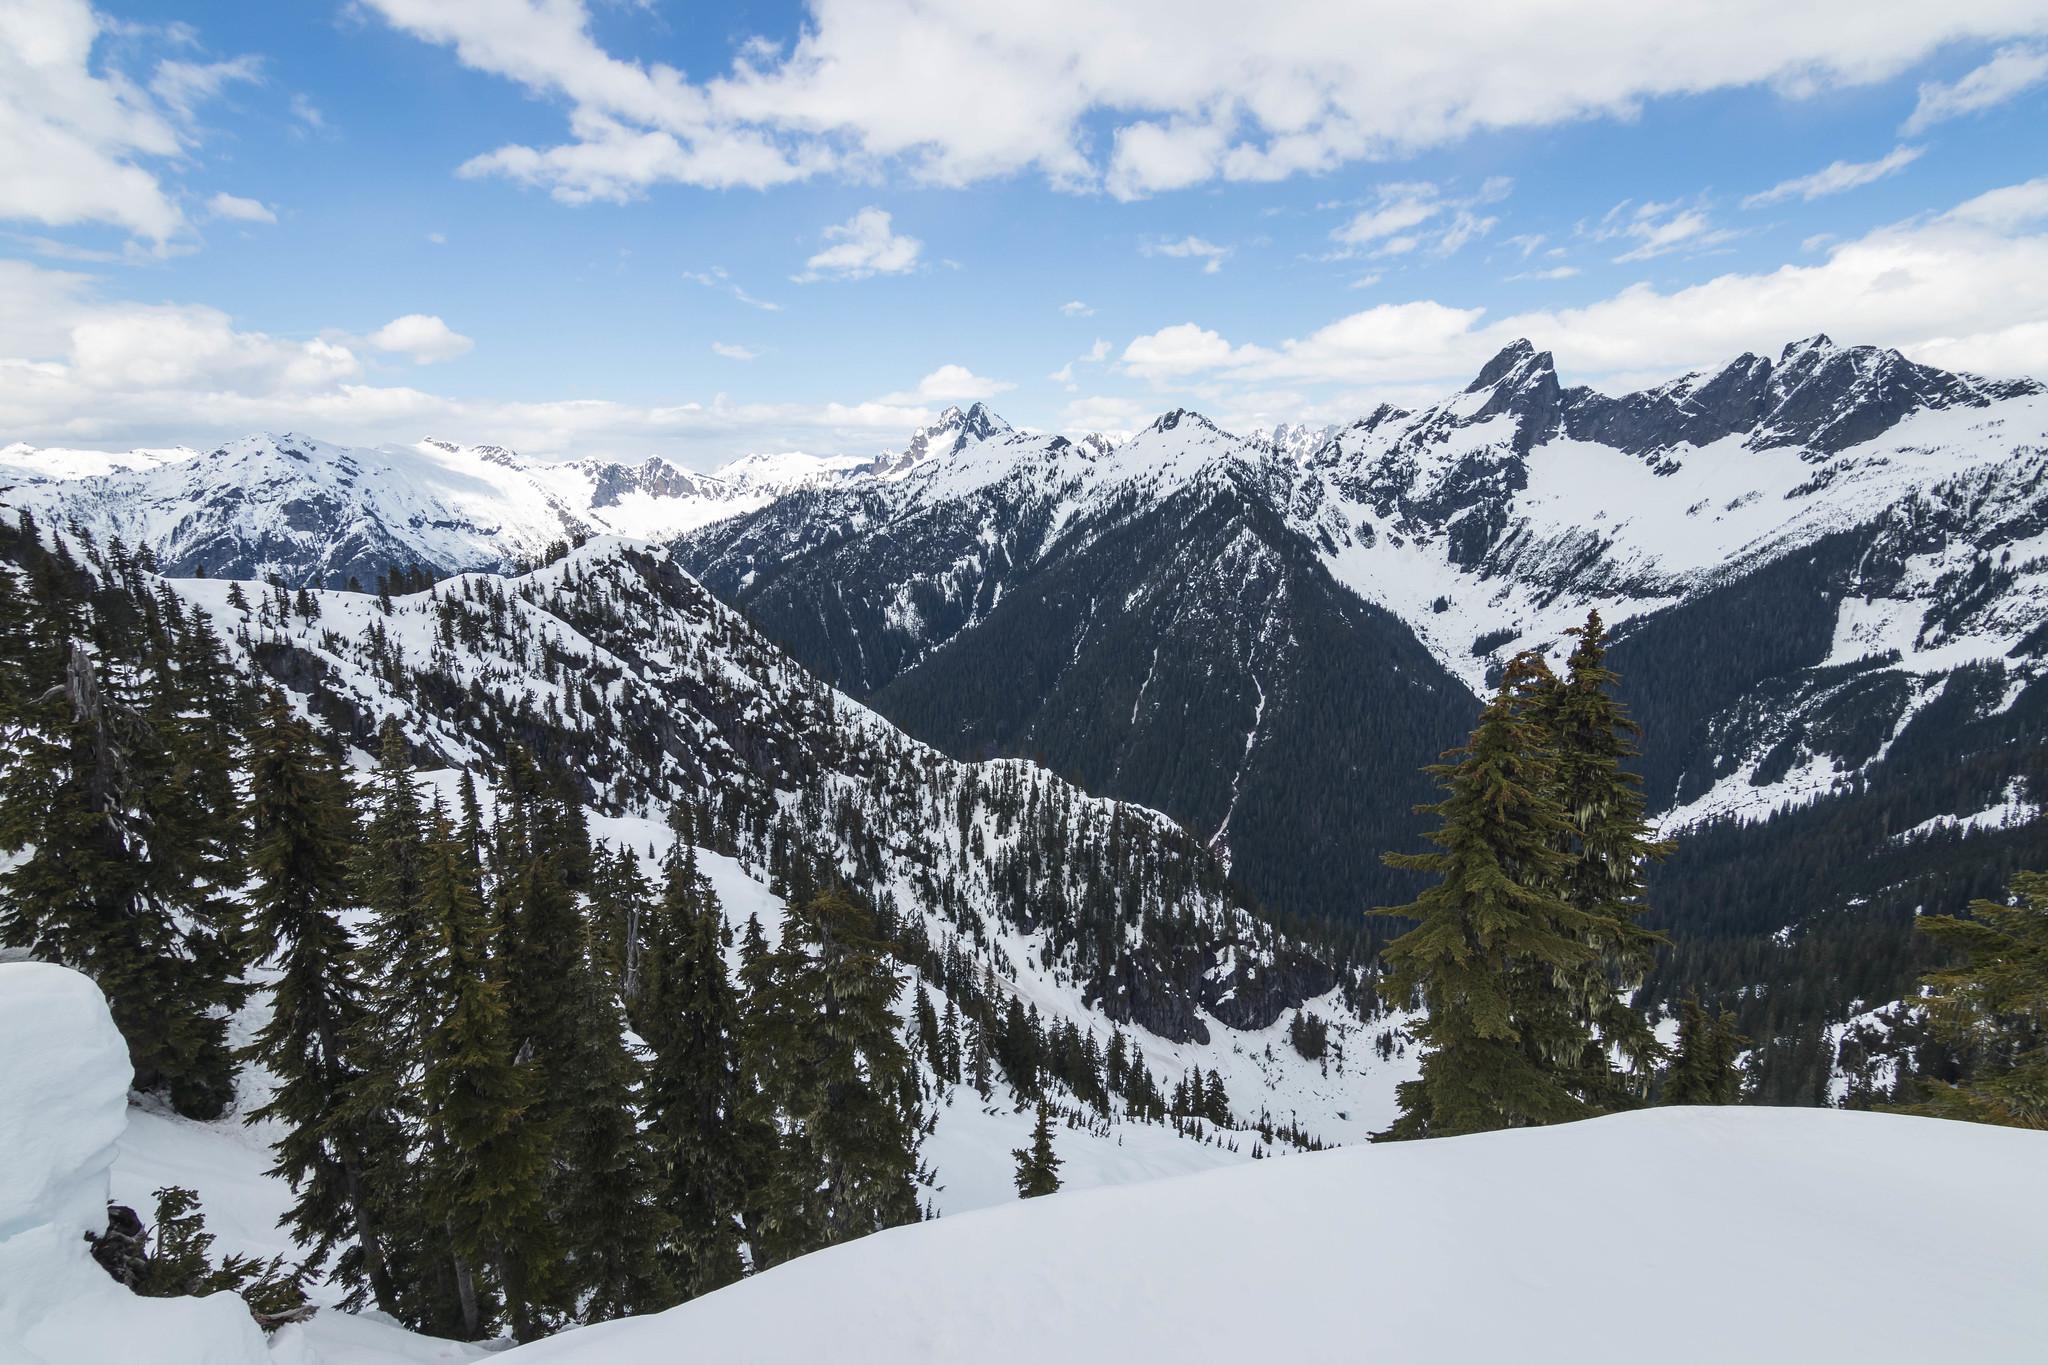 Ridgeside view to the northwest